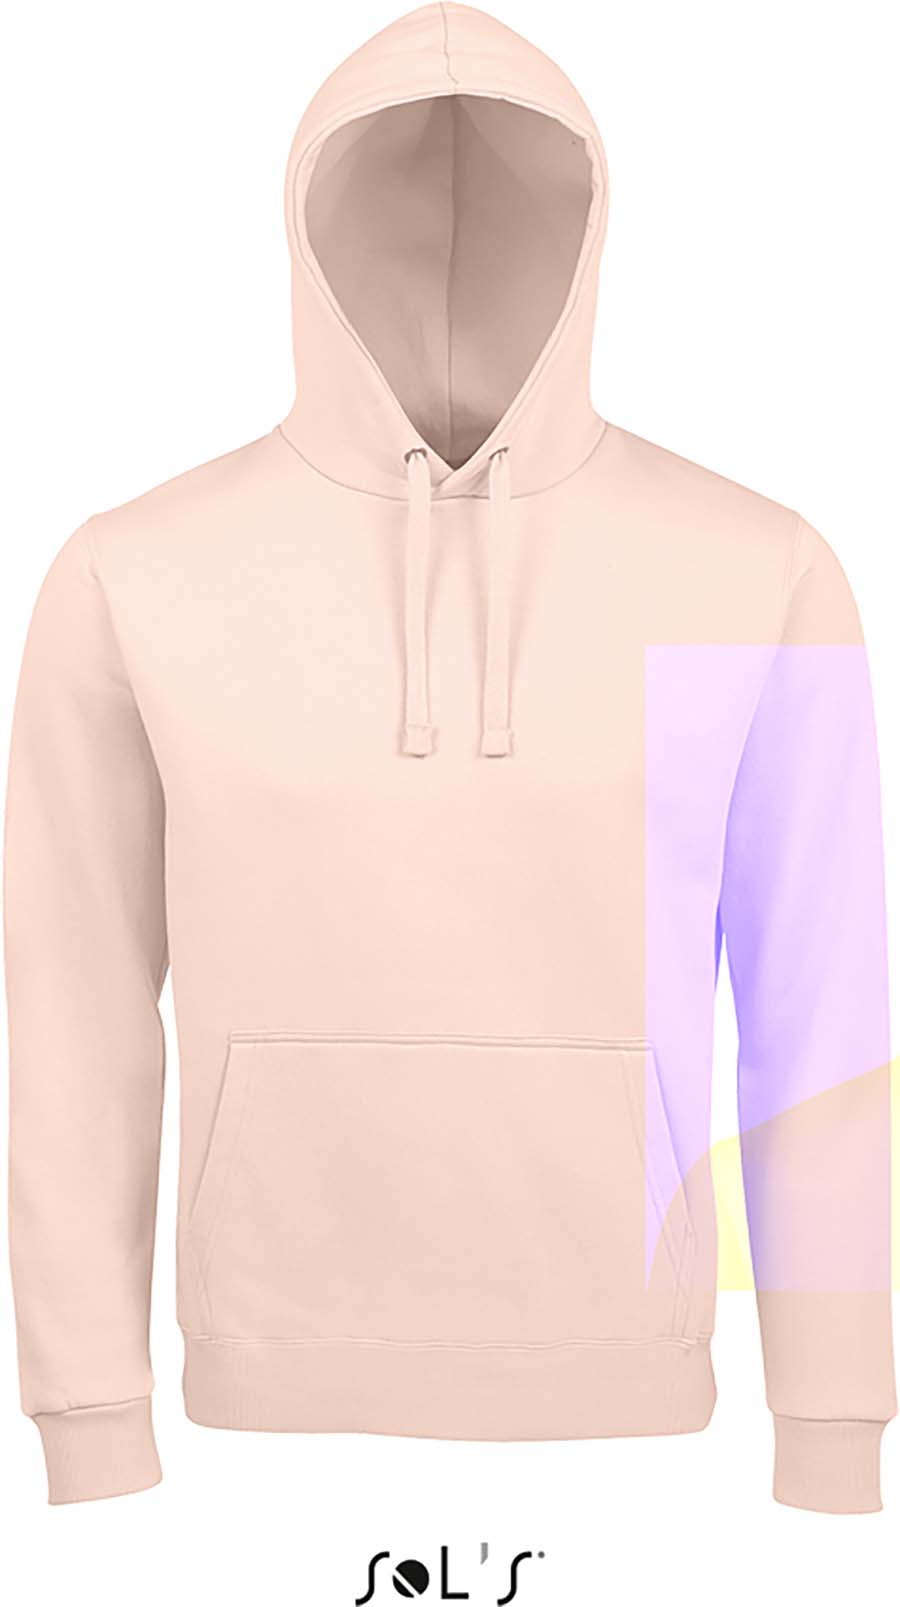 Sweat-shirt unisexe à capuche - 1-1403-8